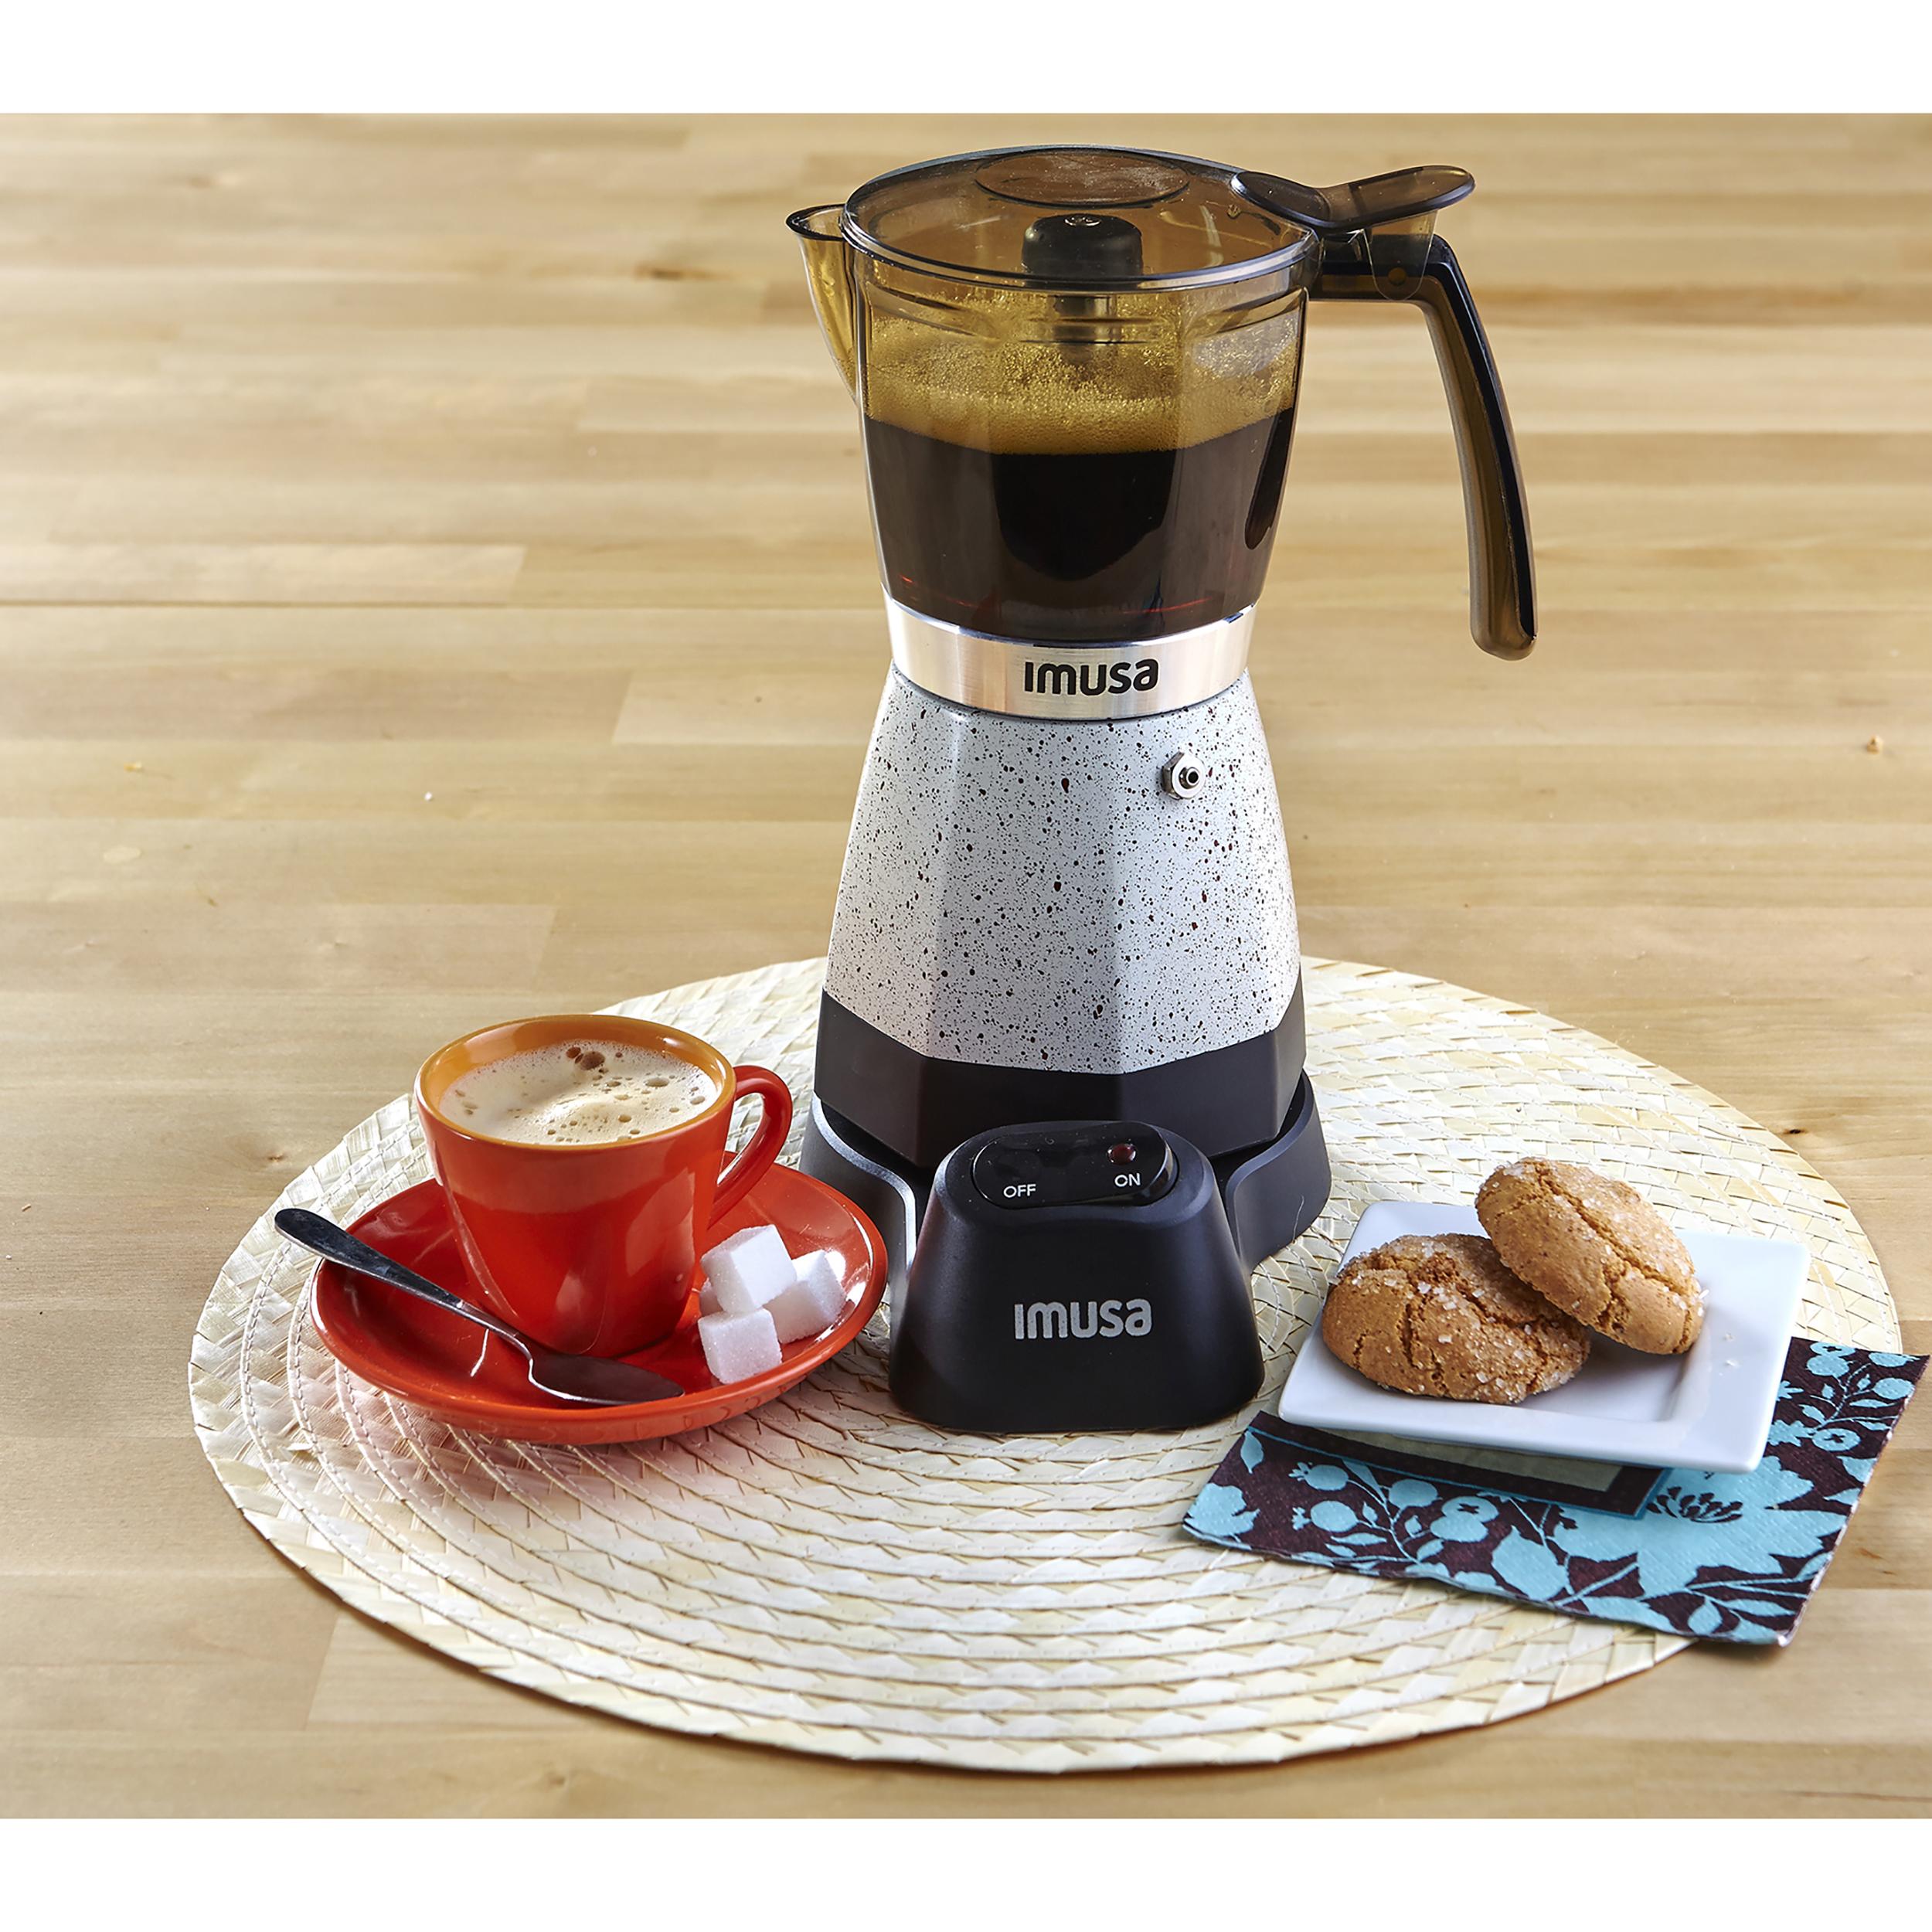 IMUSA Electric Moka Maker 3 cup & 6 cup 480 Watts, Silver